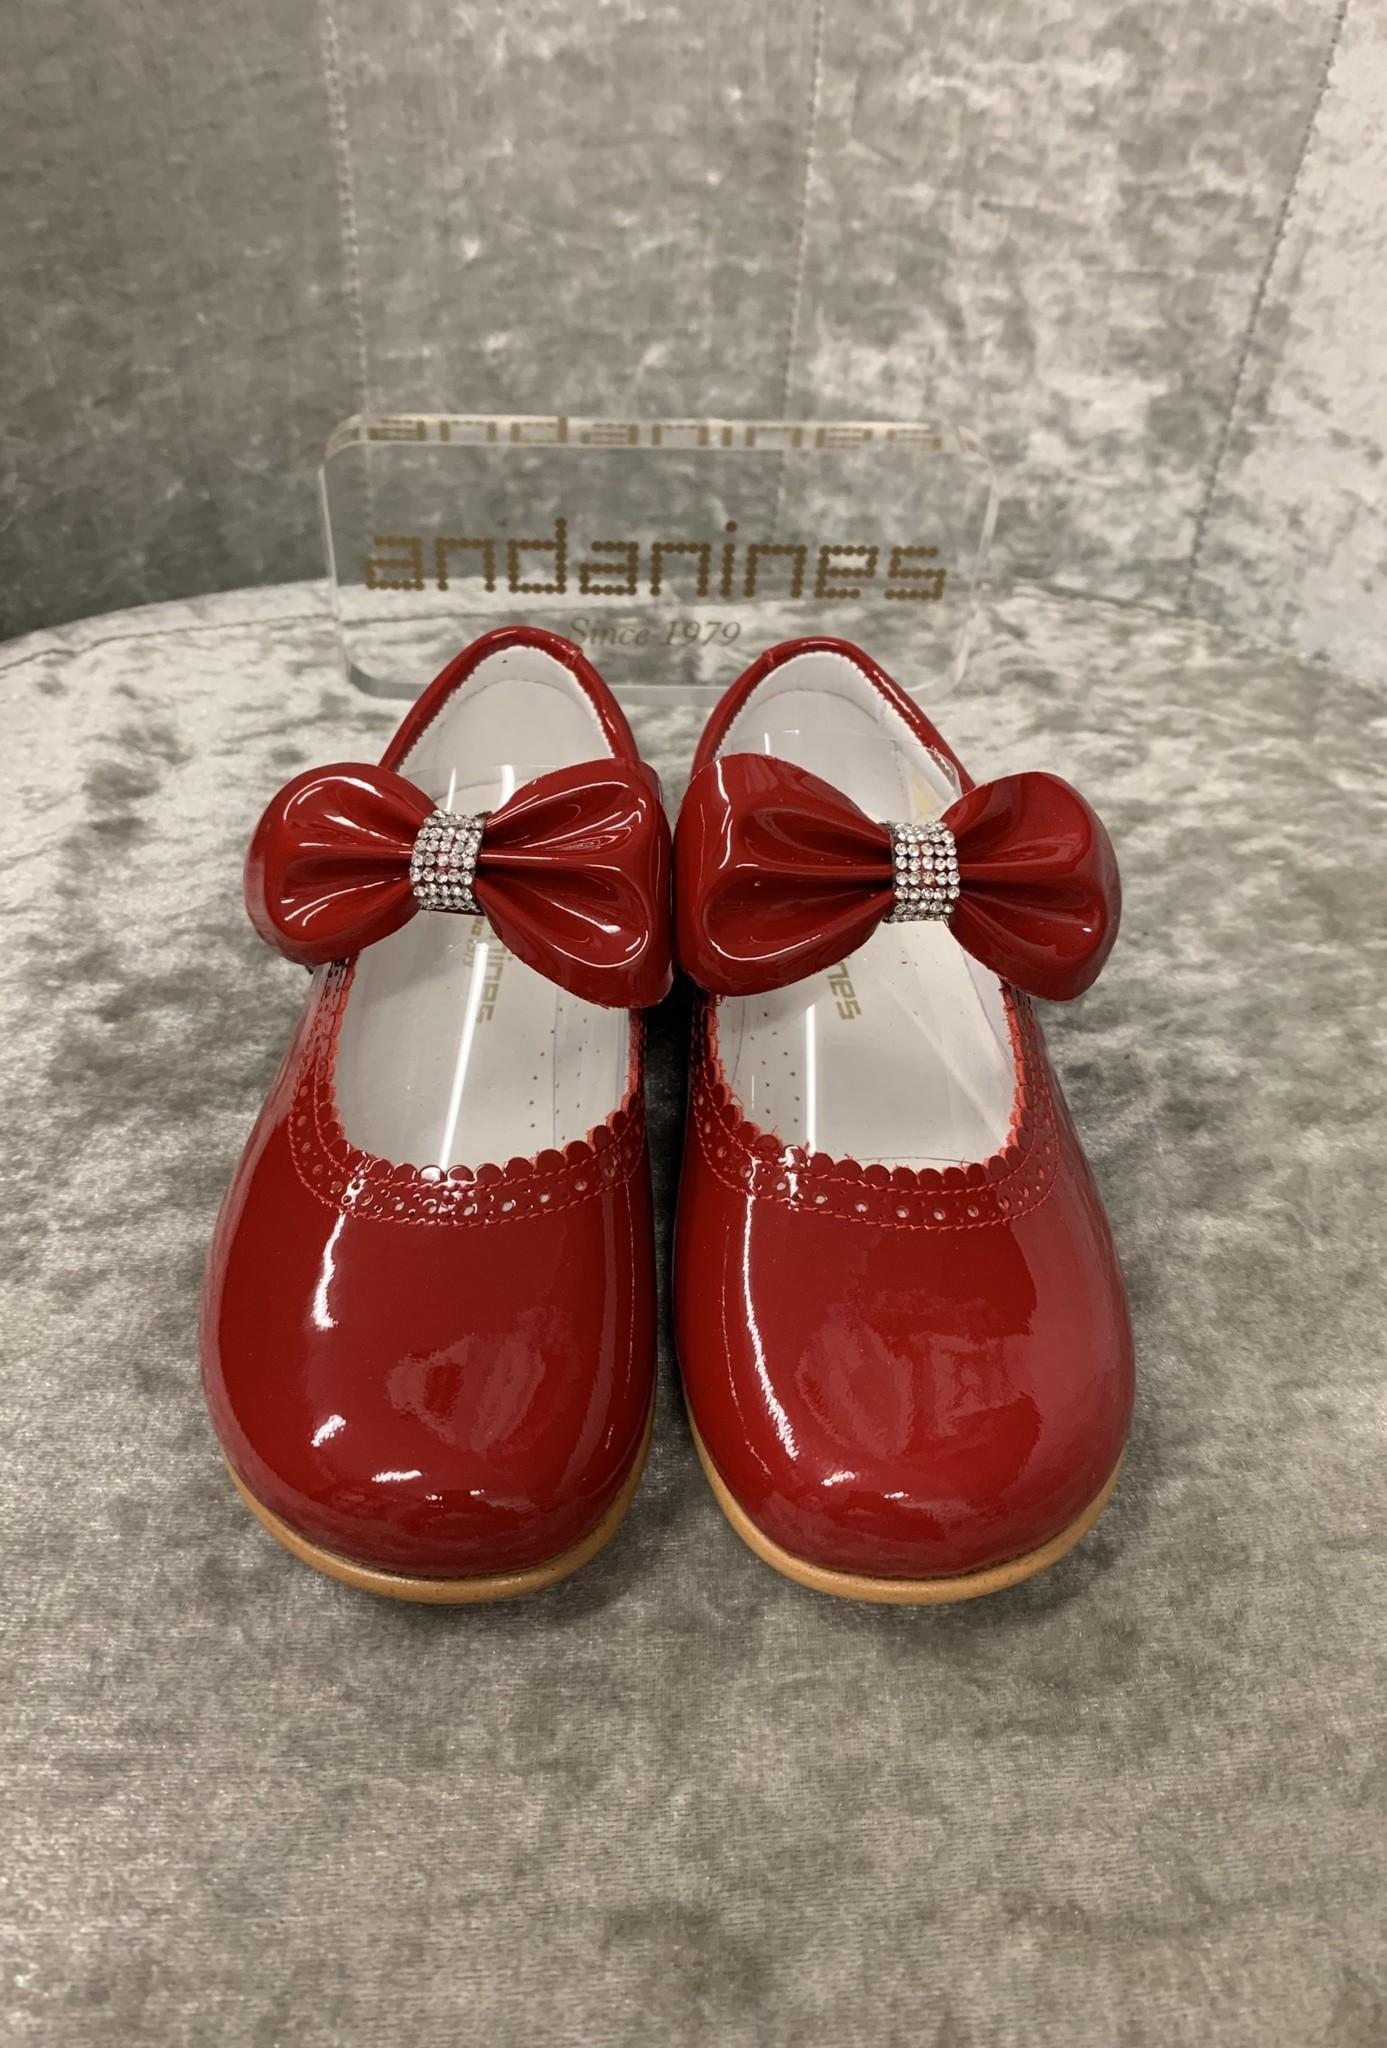 Andanines Andanines Girls Red Diamonte Bow Shoe